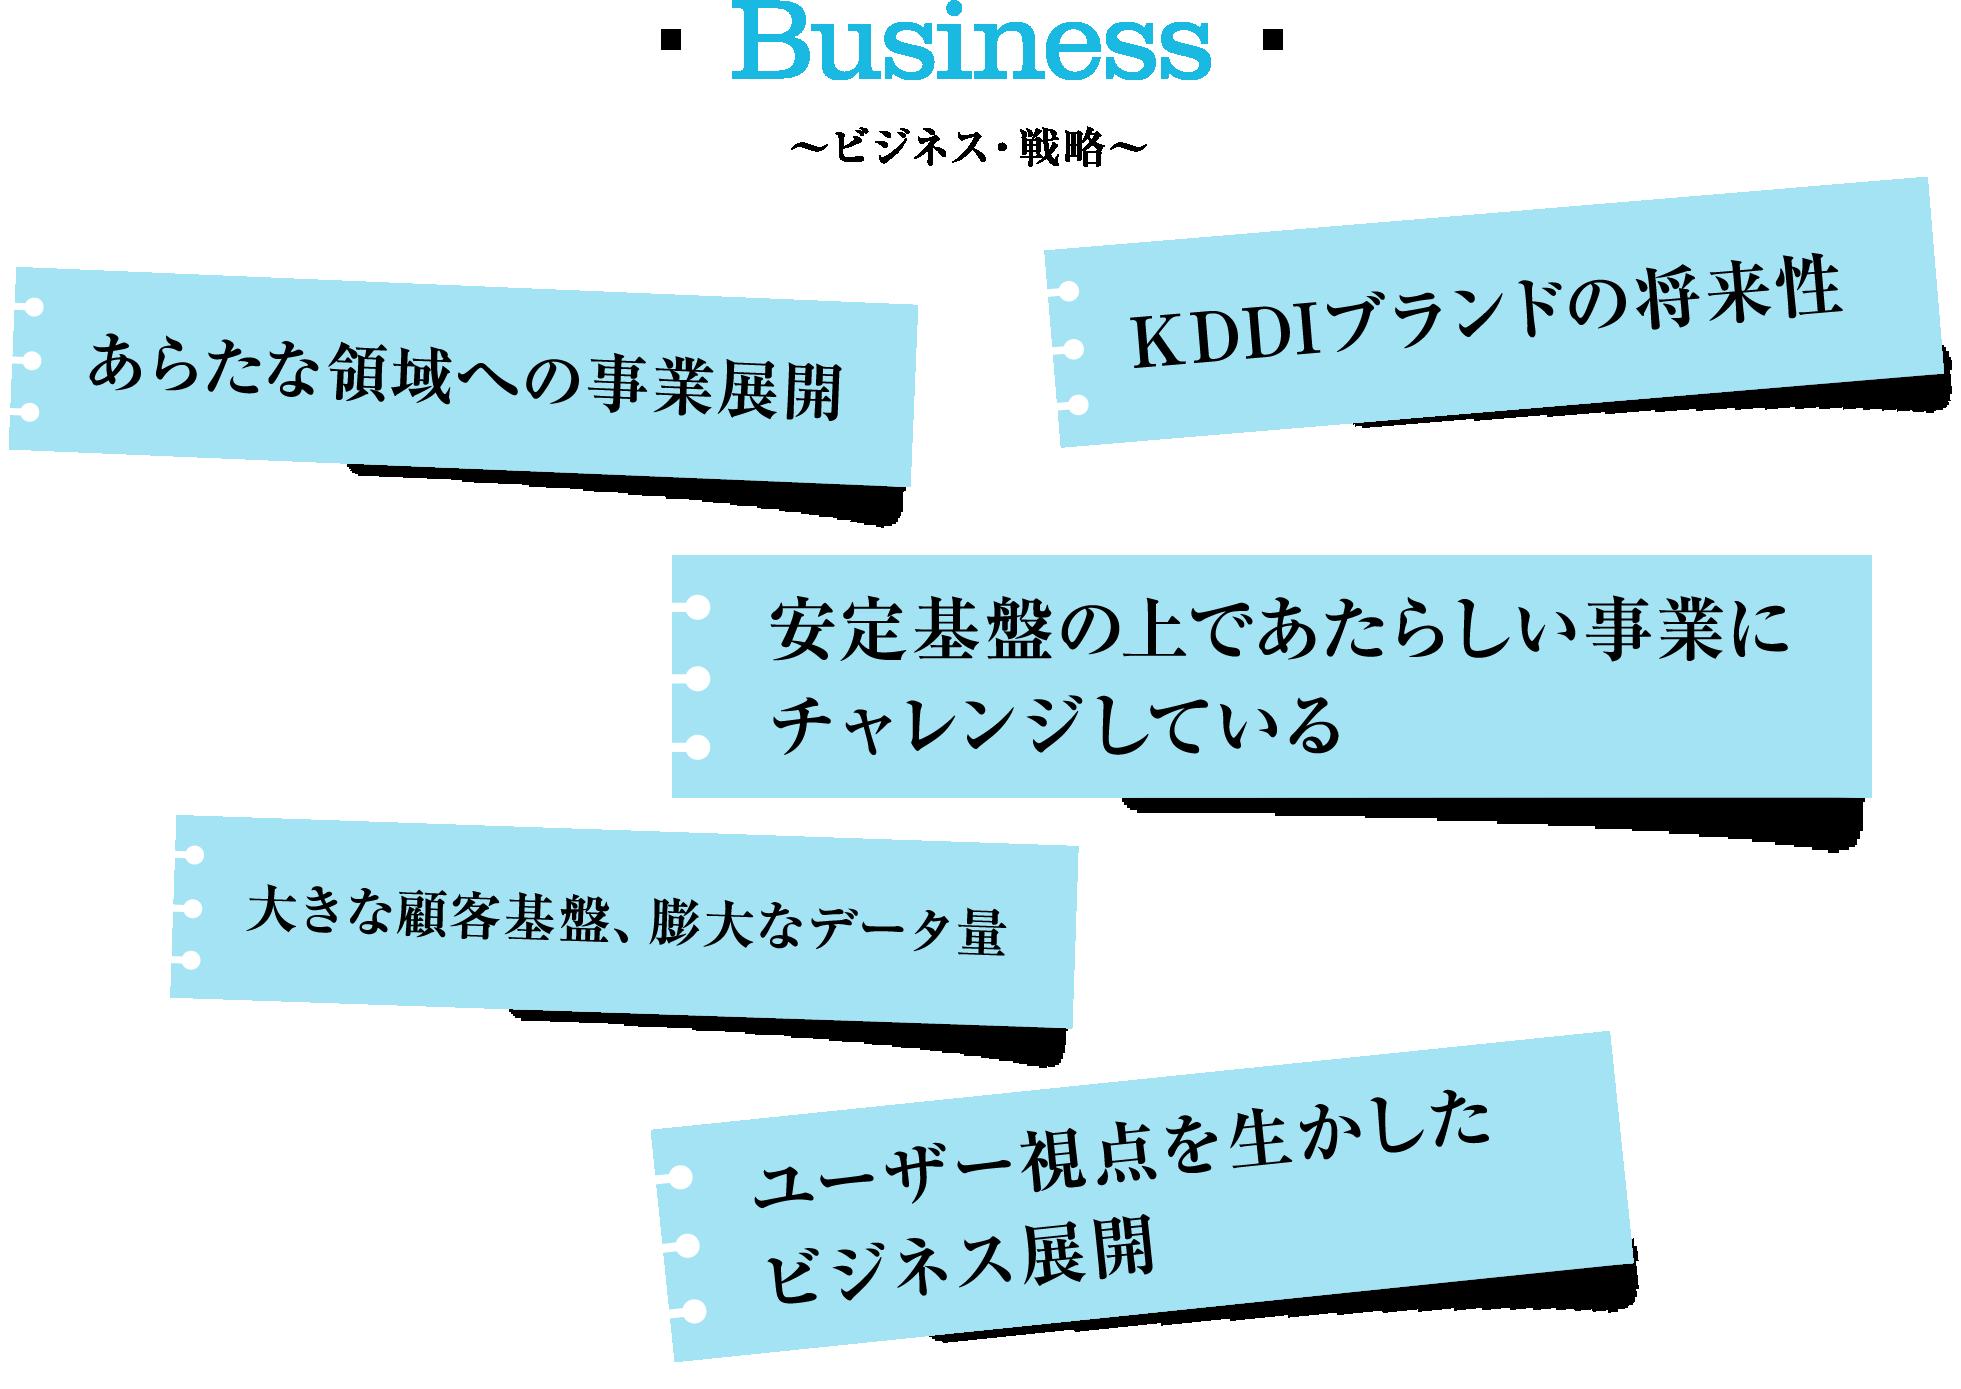 Business~ビジネス・戦略~ KDDIブランドの将来性 あらたな領域への事業展開 安定基盤の上であたらしい事業に 大きな顧客基盤、膨大なデータ量 ユーザー視点を生かした ビジネス展開 チャレンジしている